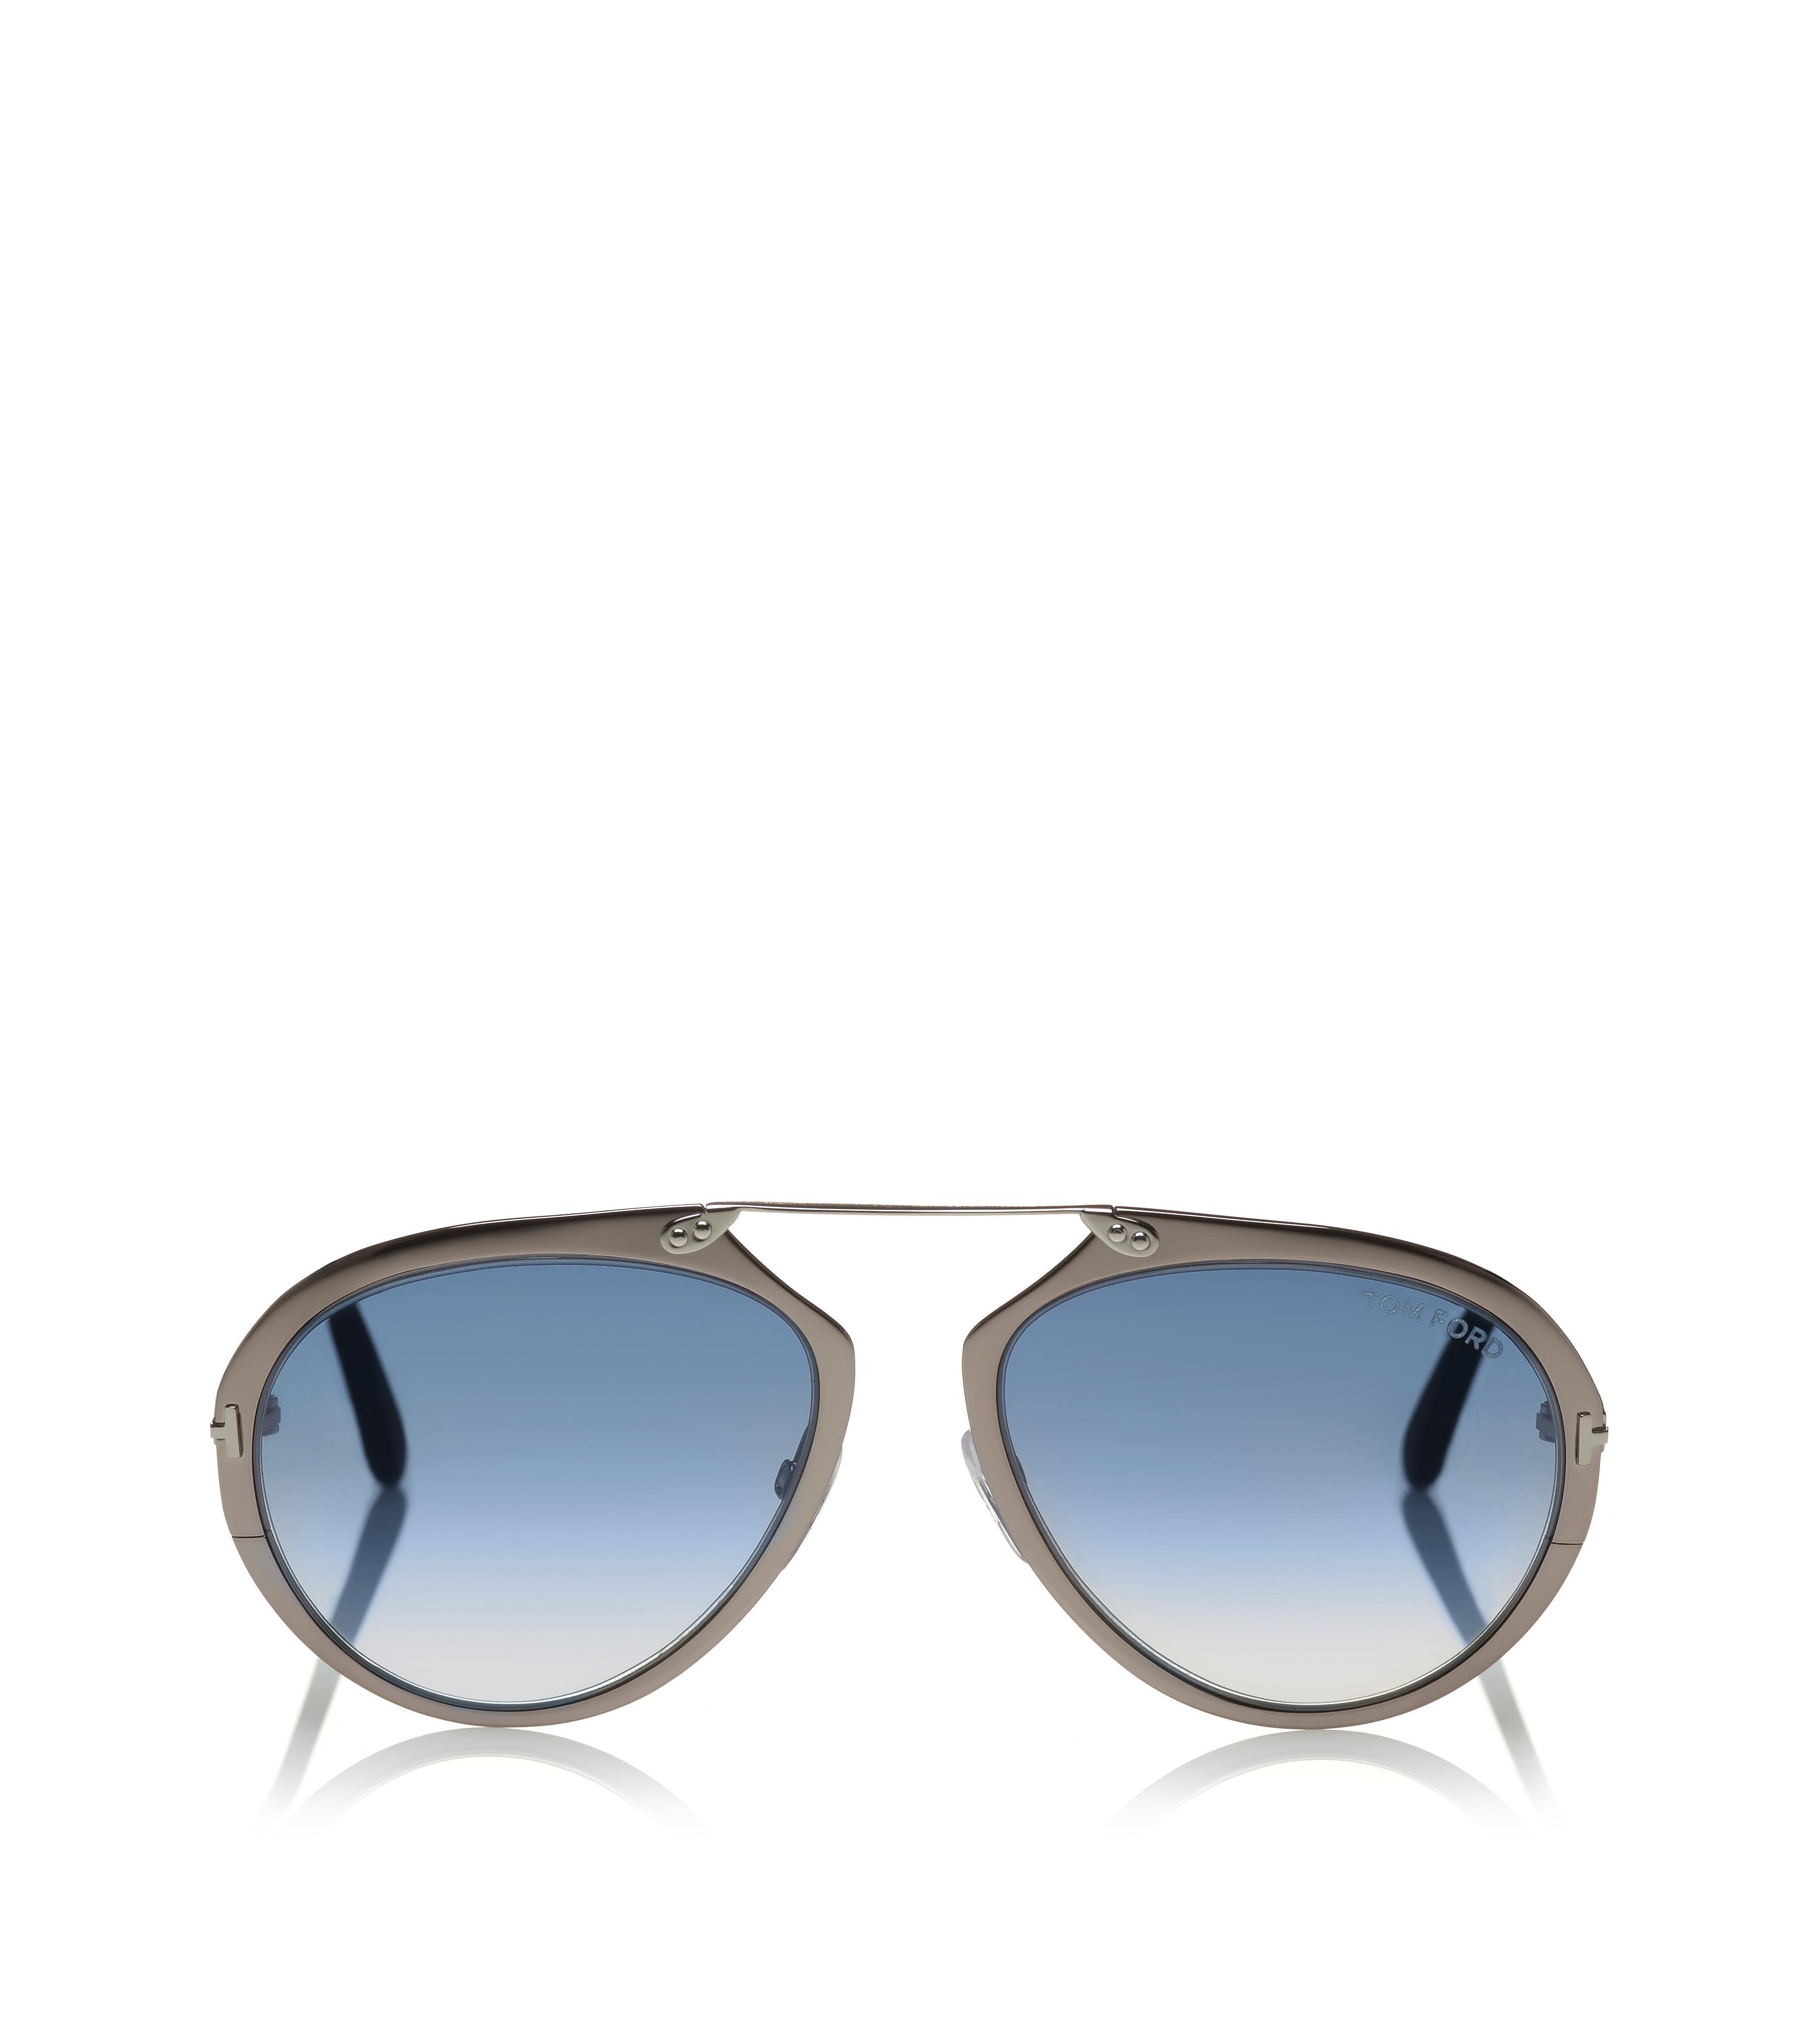 Glasses Frames Turn White : Sunglasses - Womens Eyewear TomFord.com